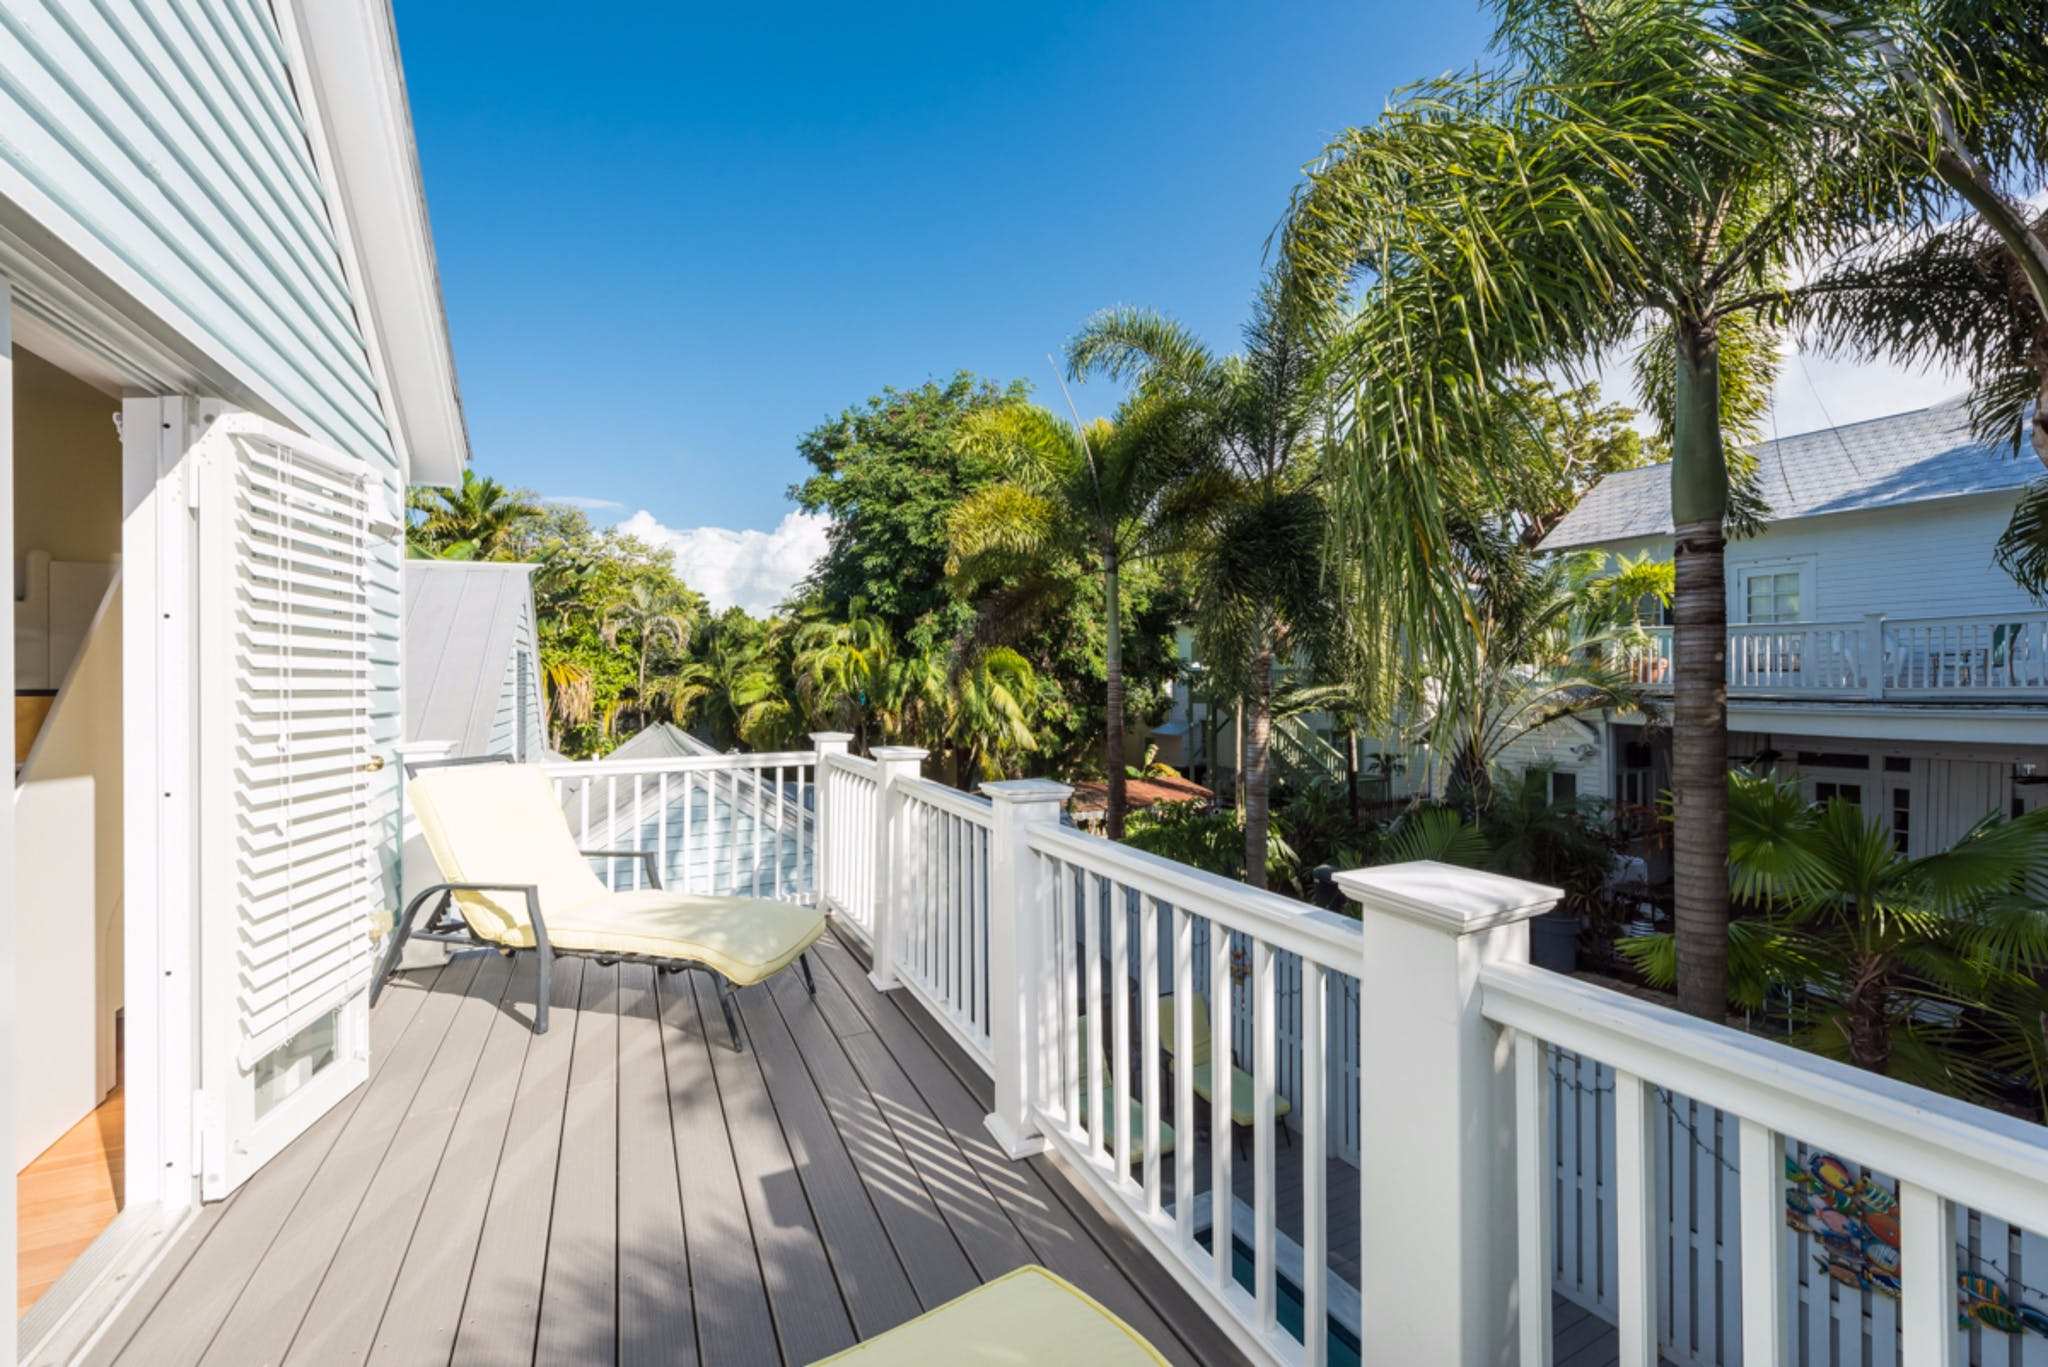 Outstanding Rent Mermaid Manor New Monthly Rental Key West Vacation Interior Design Ideas Clesiryabchikinfo